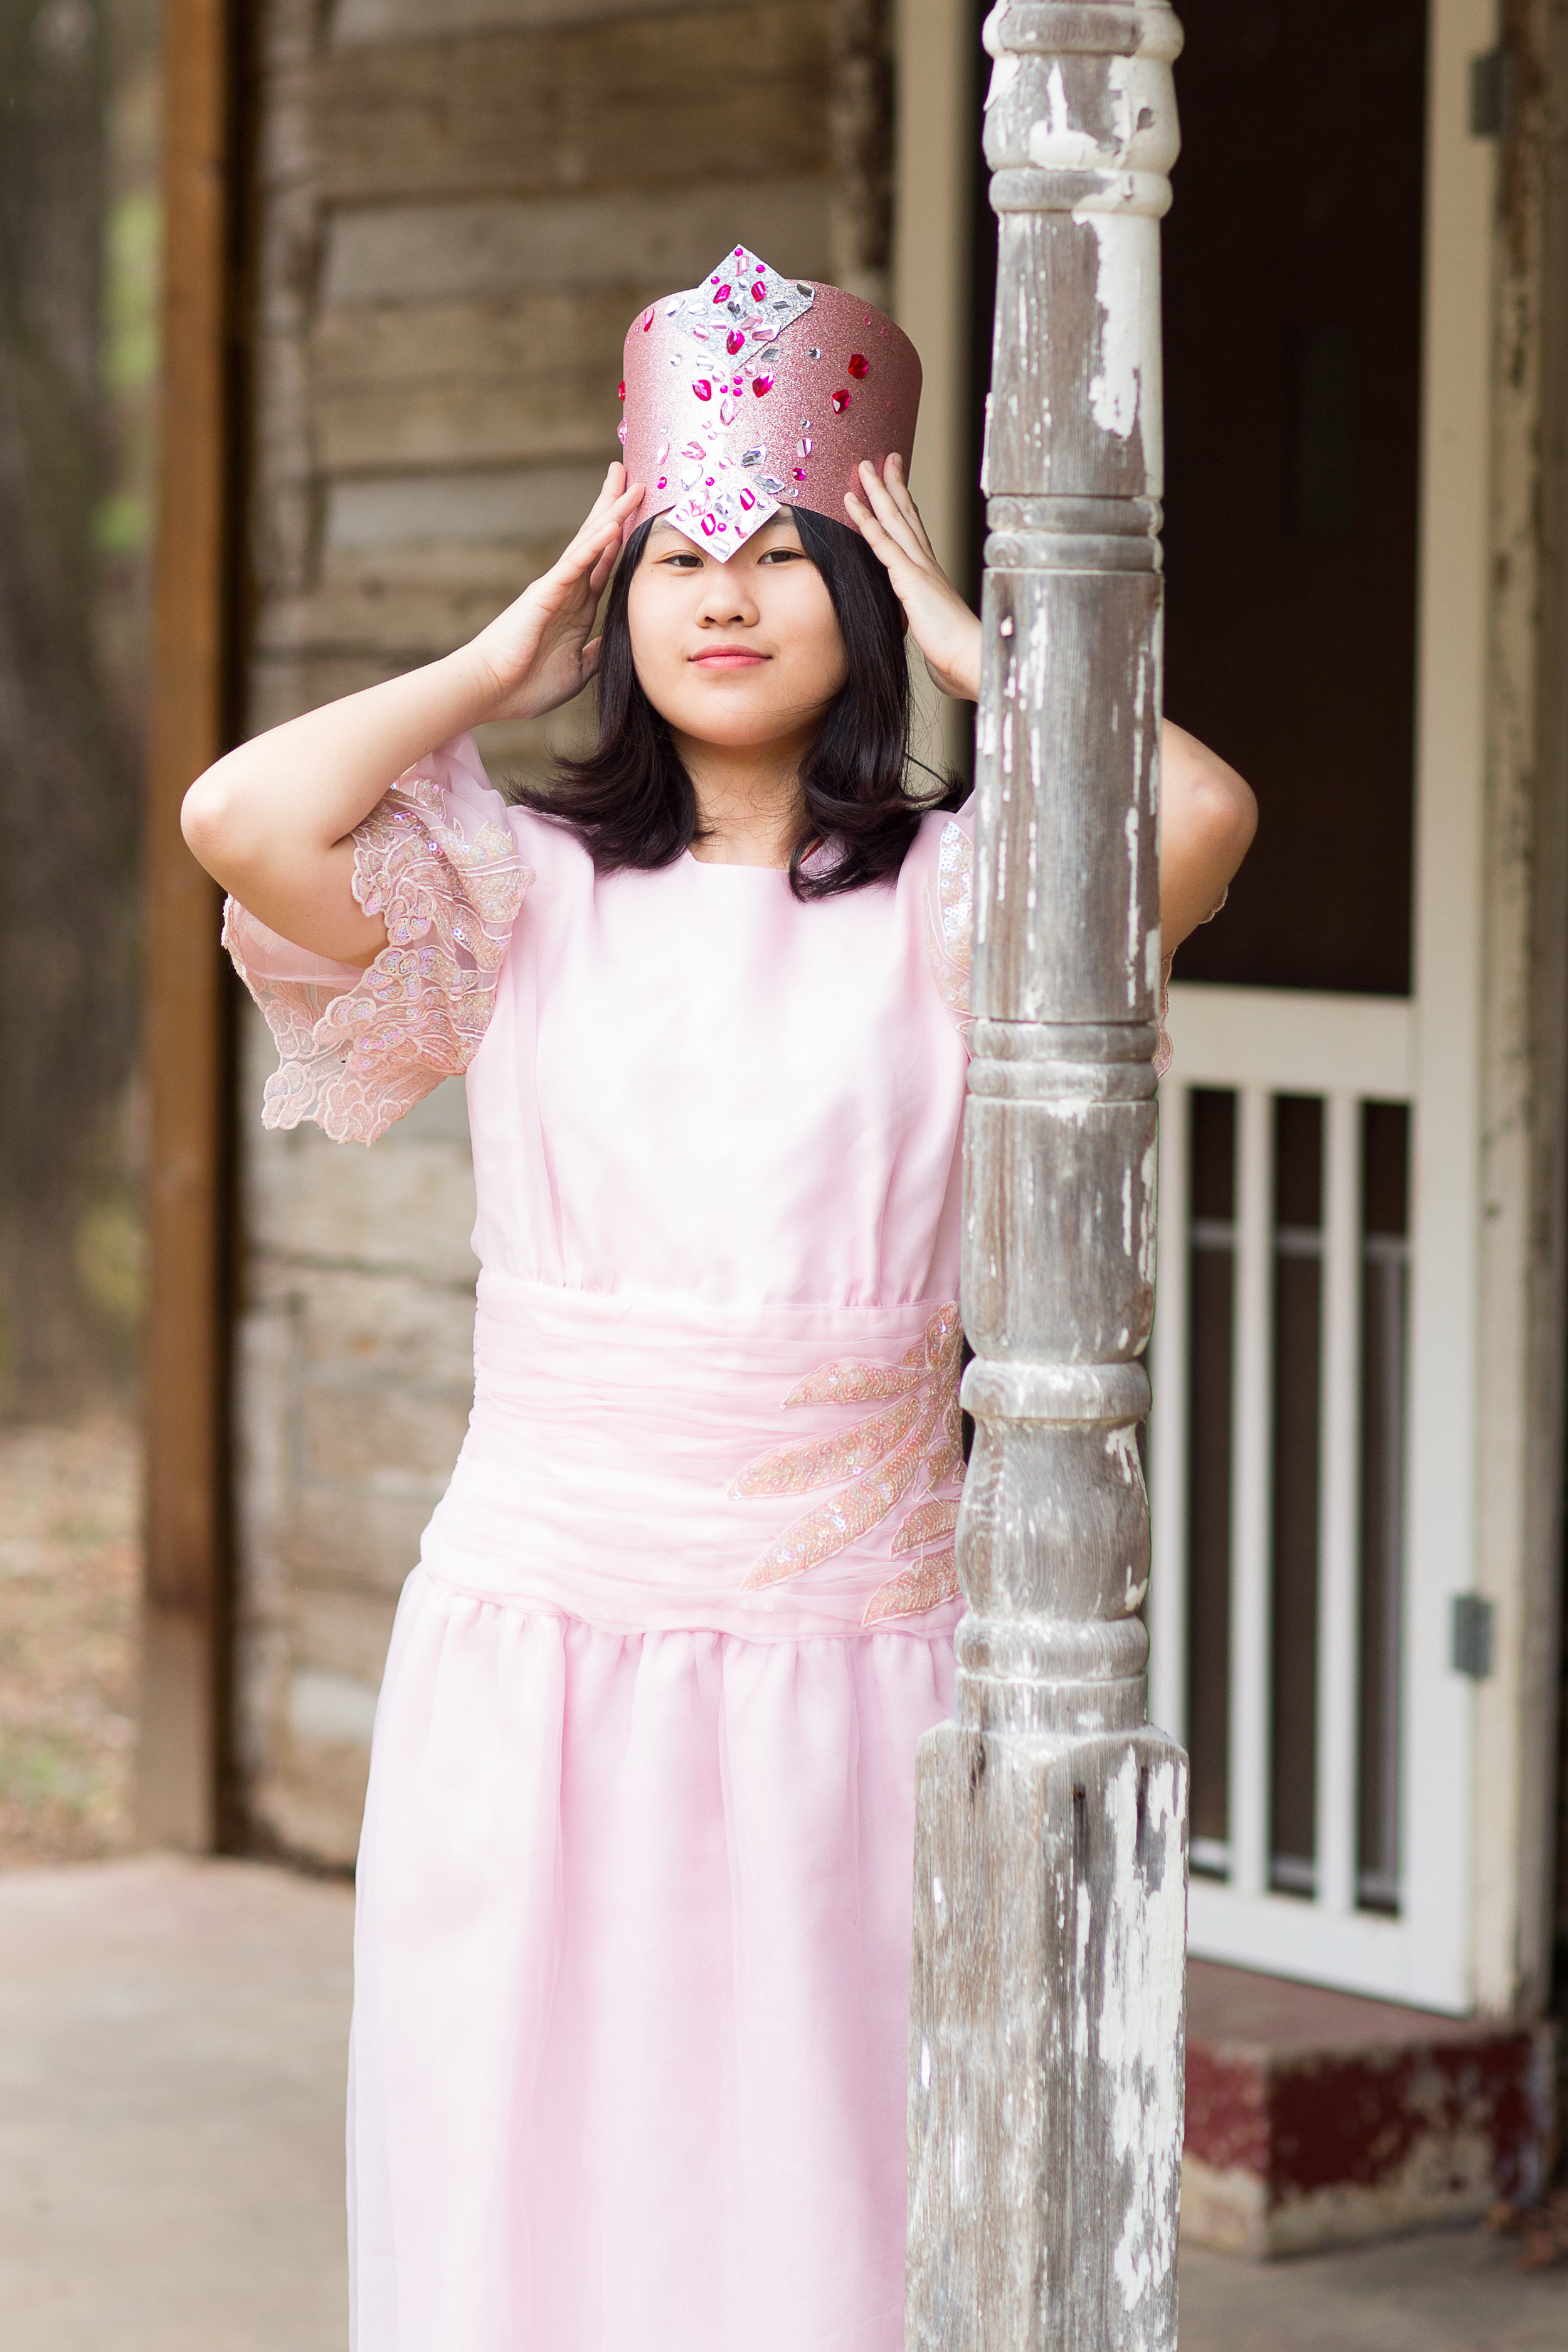 Jenny Jiang as Glinda